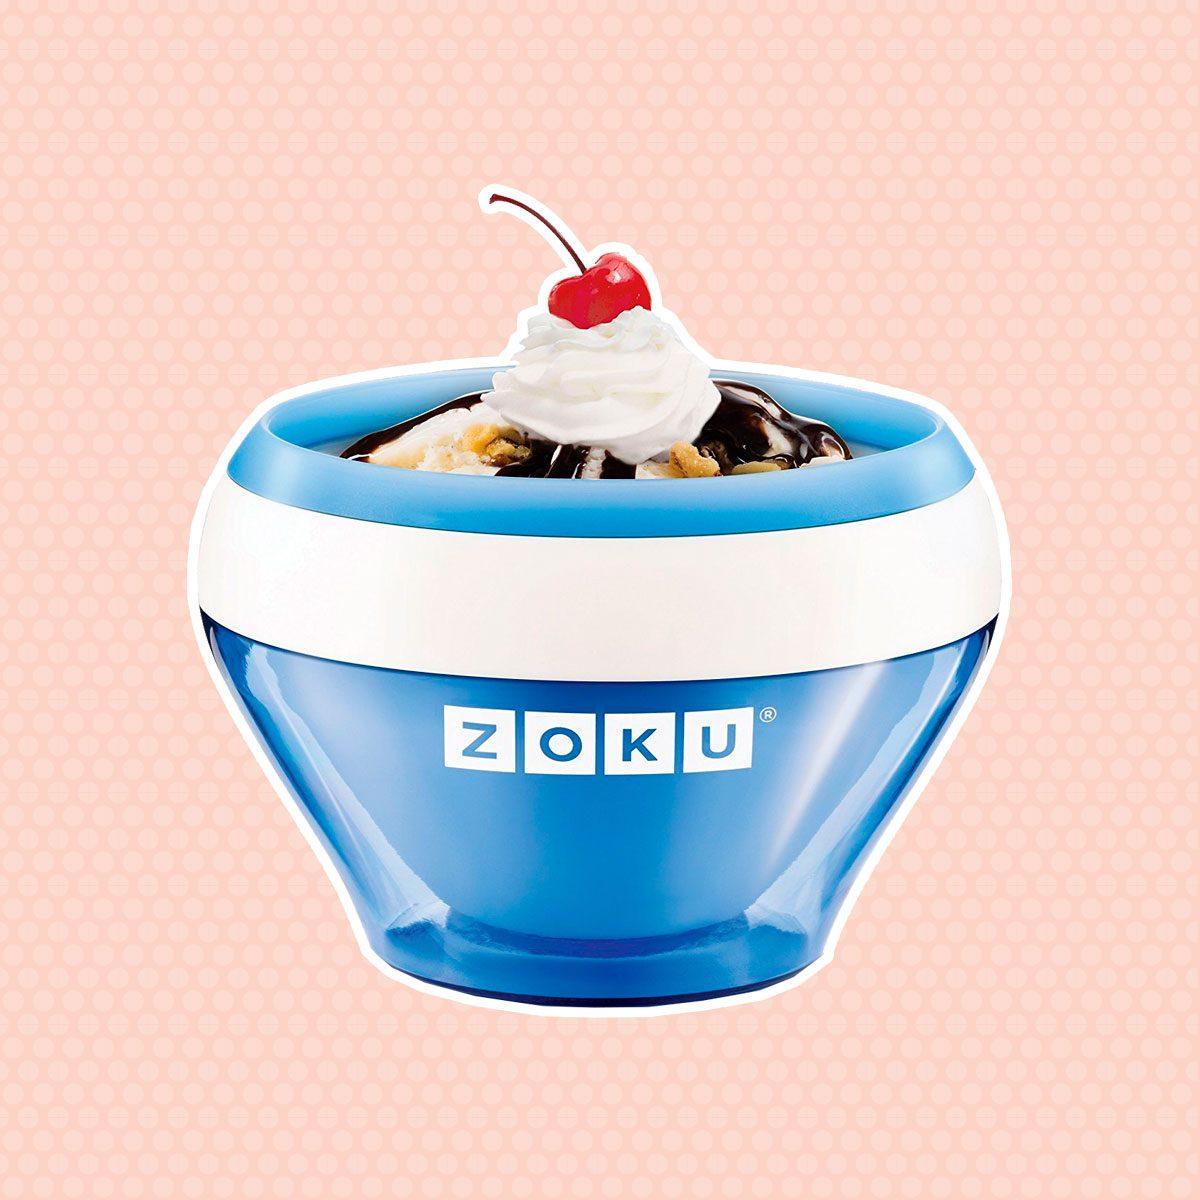 Zoku Ice Cream Maker